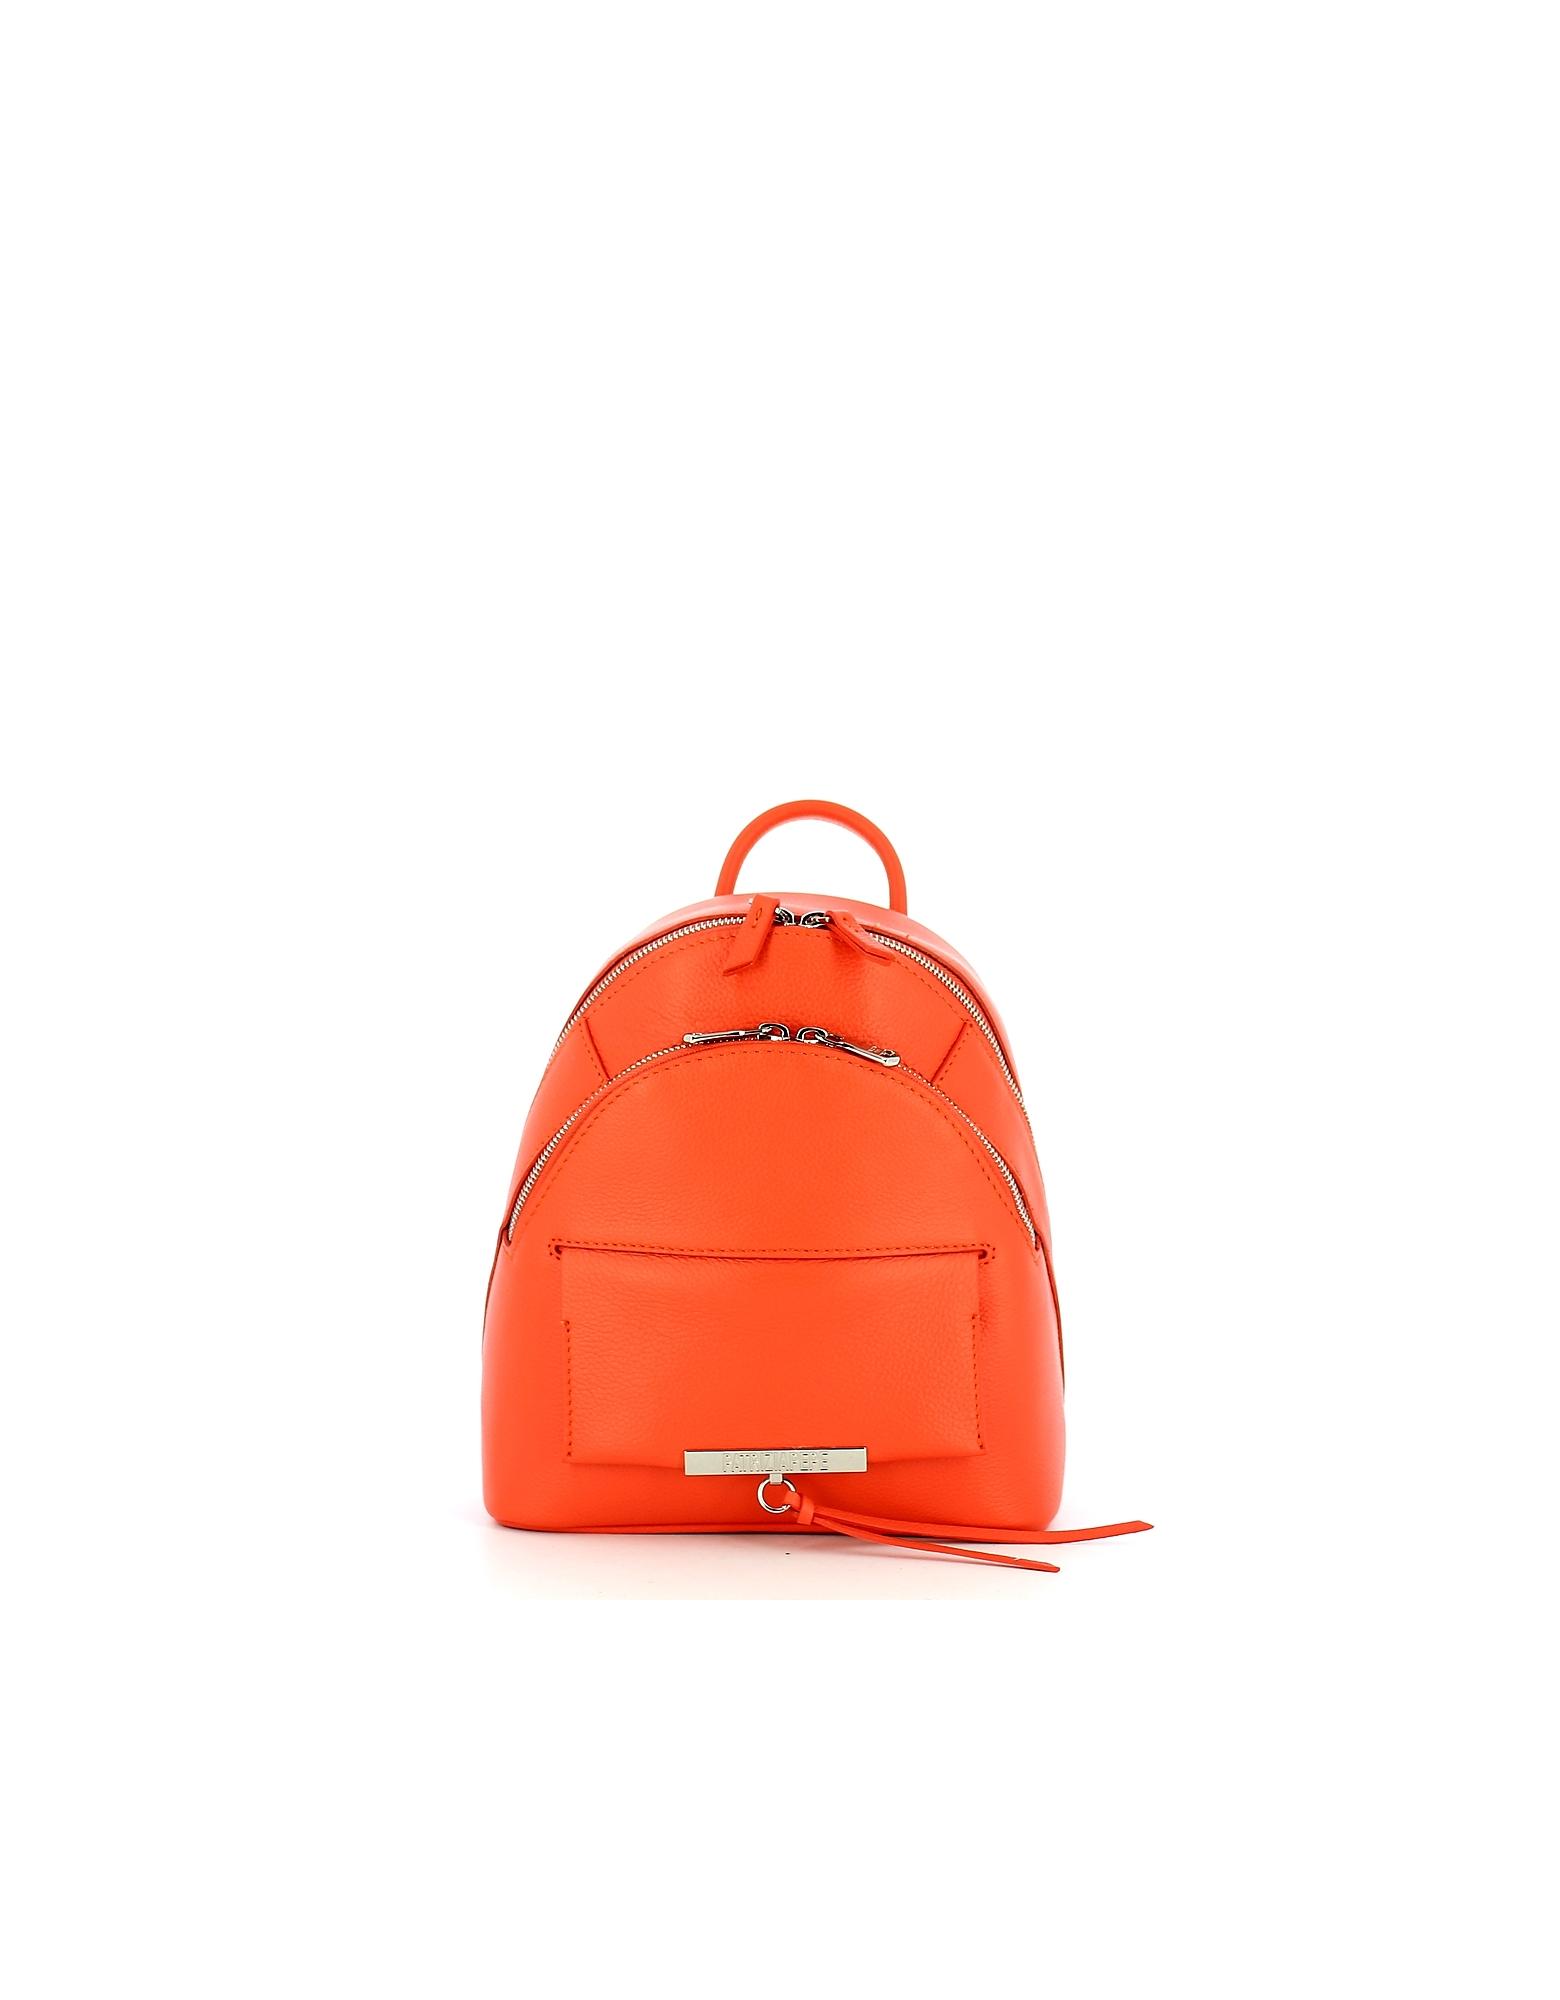 Patrizia Pepe Designer Handbags, Women's Red Bag